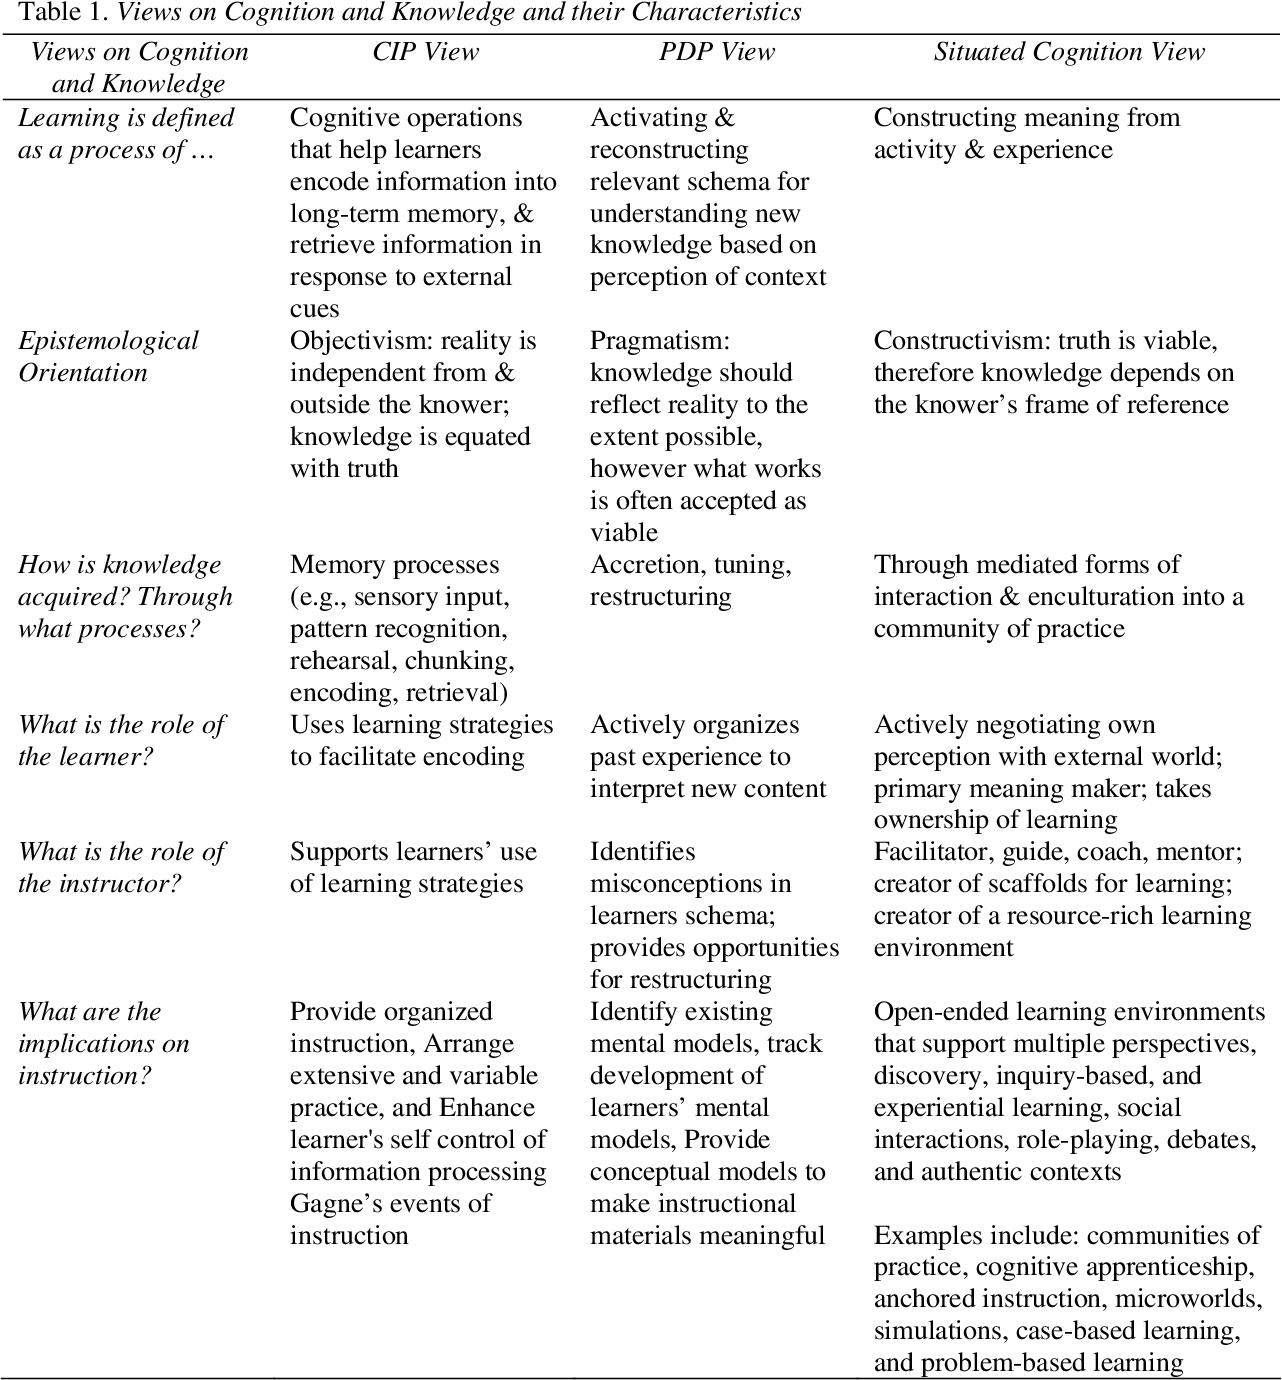 Pdf Pedagogical Models For E Learning A Theory Based Design Framework Semantic Scholar